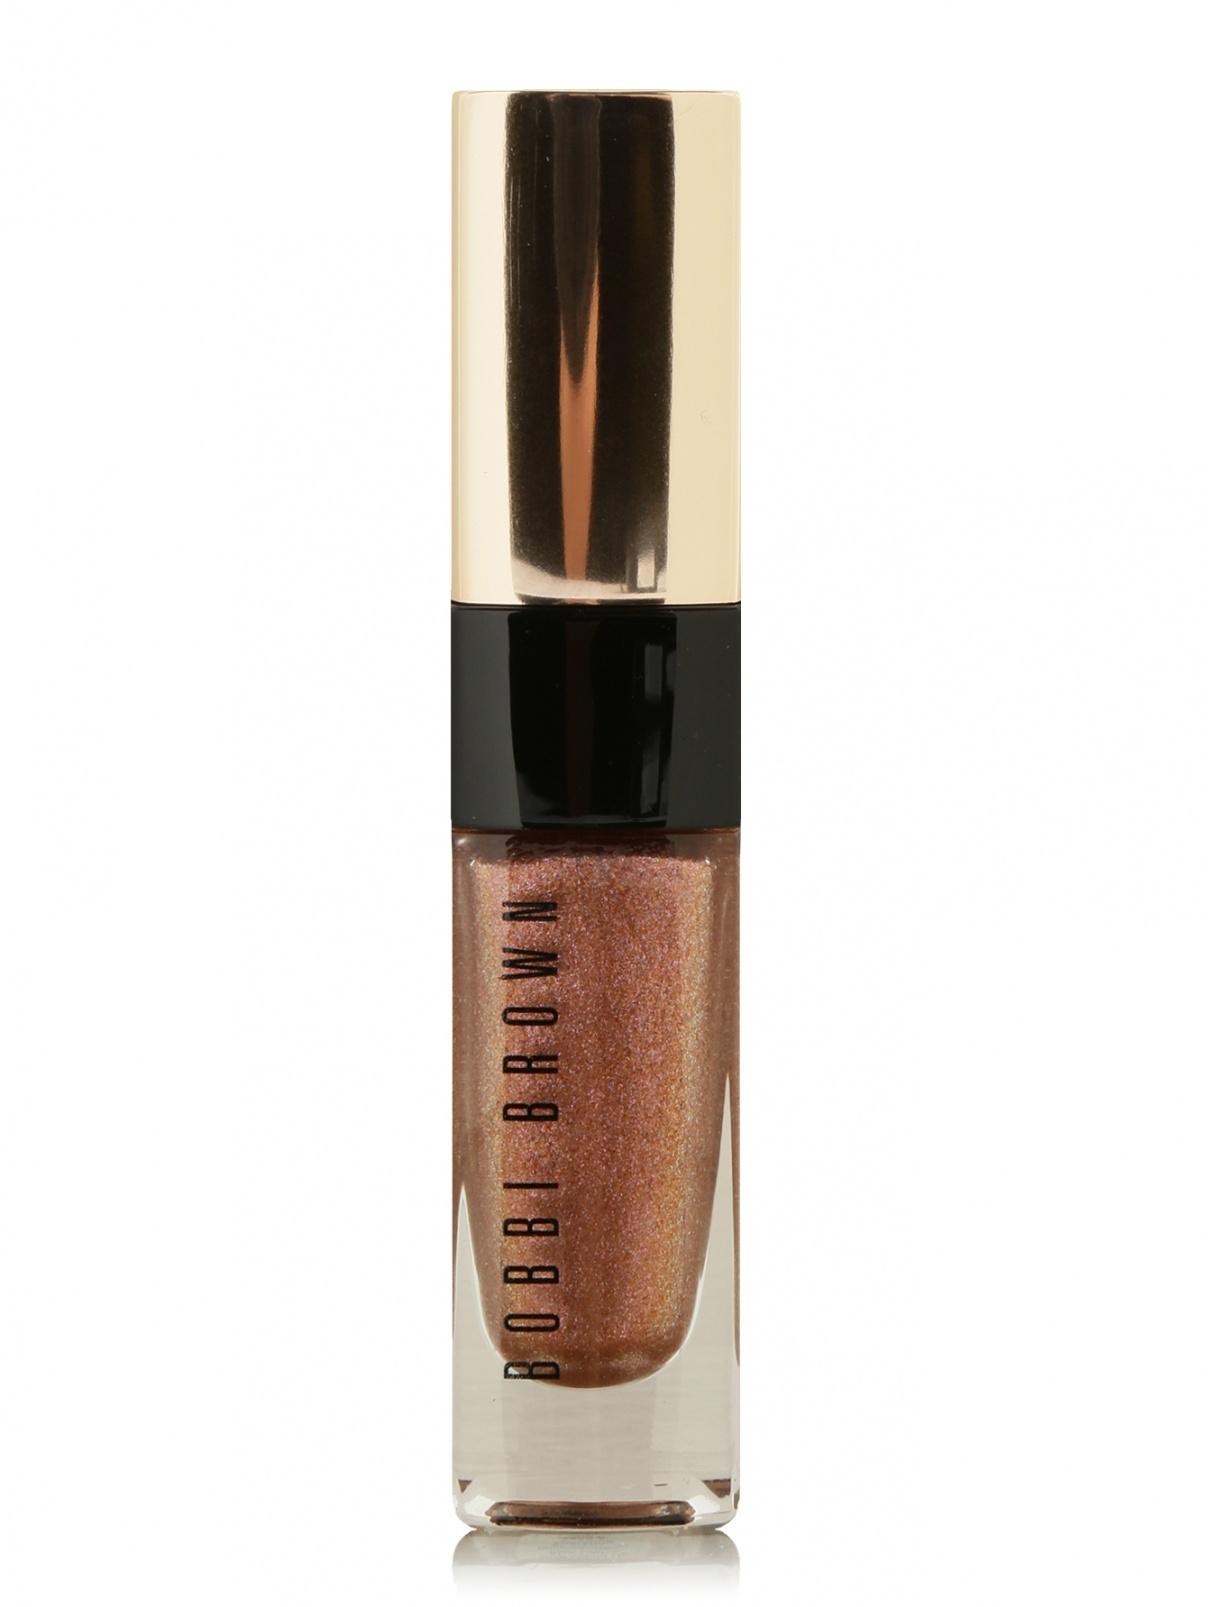 Помада Luxe Liquid Lip Rich Lustre оттенок - Sparkling Sand Makeup Bobbi Brown  –  Общий вид